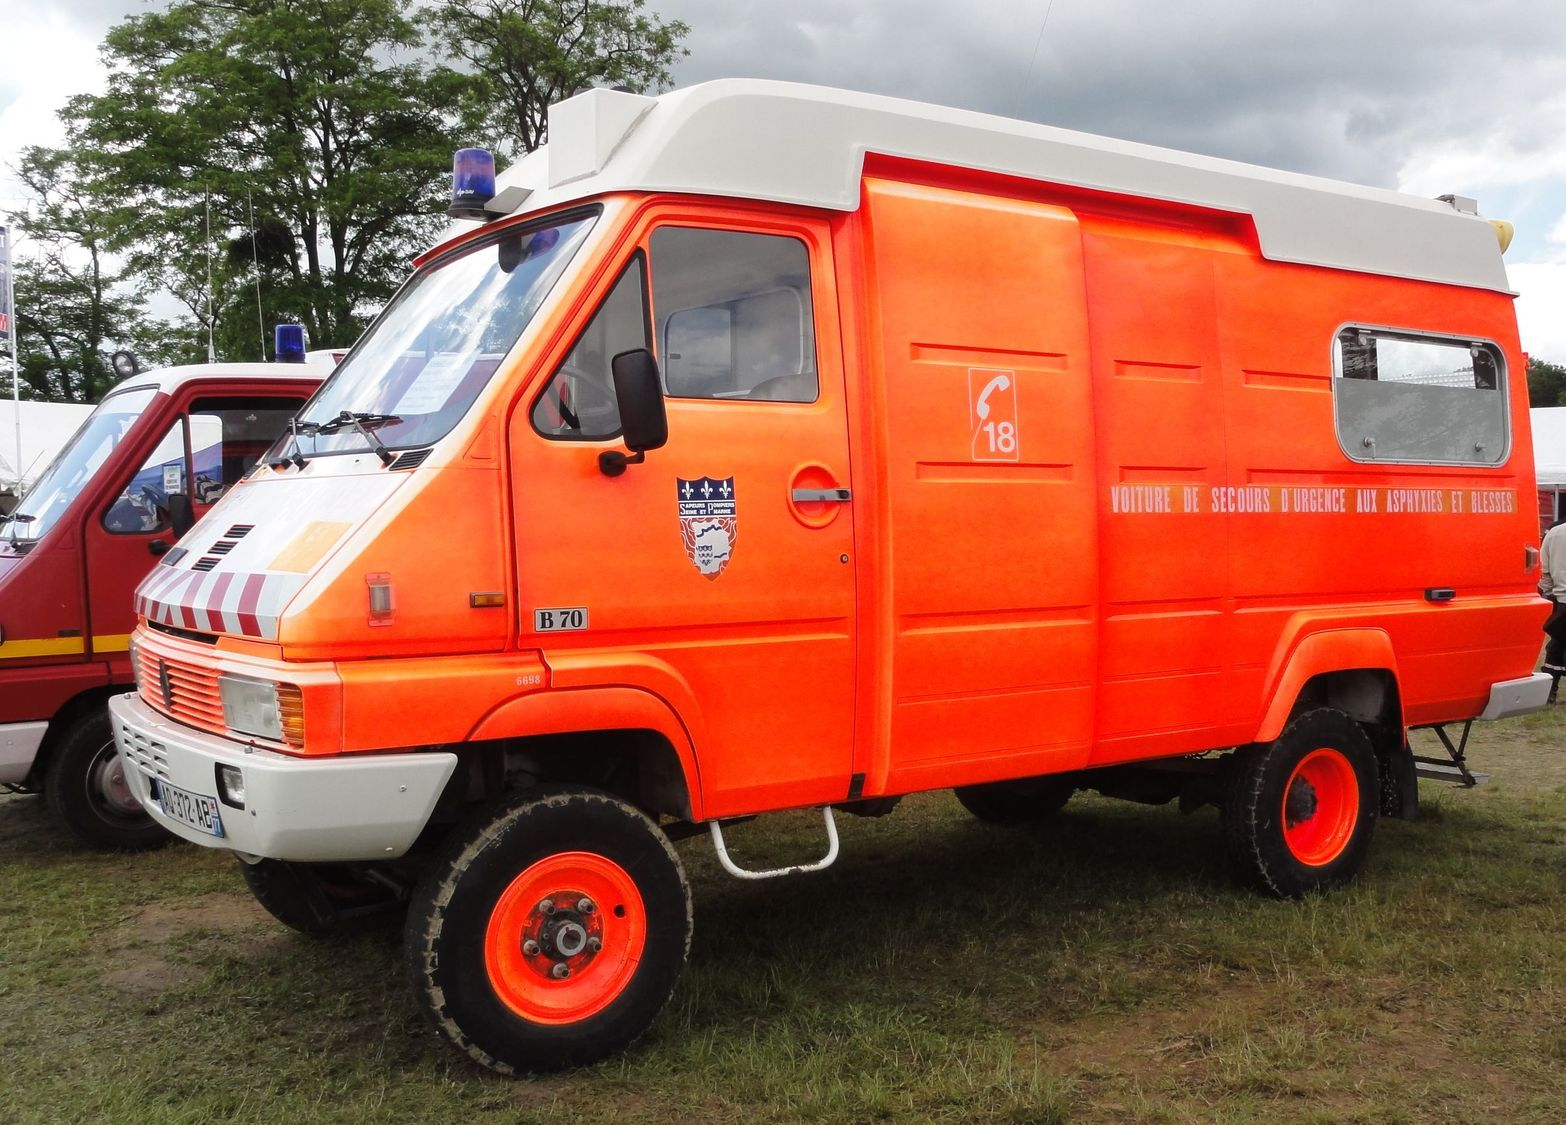 renault rvi b70 4x4 france locomotion en fete cerny pompiers pompiers renault trucks f. Black Bedroom Furniture Sets. Home Design Ideas